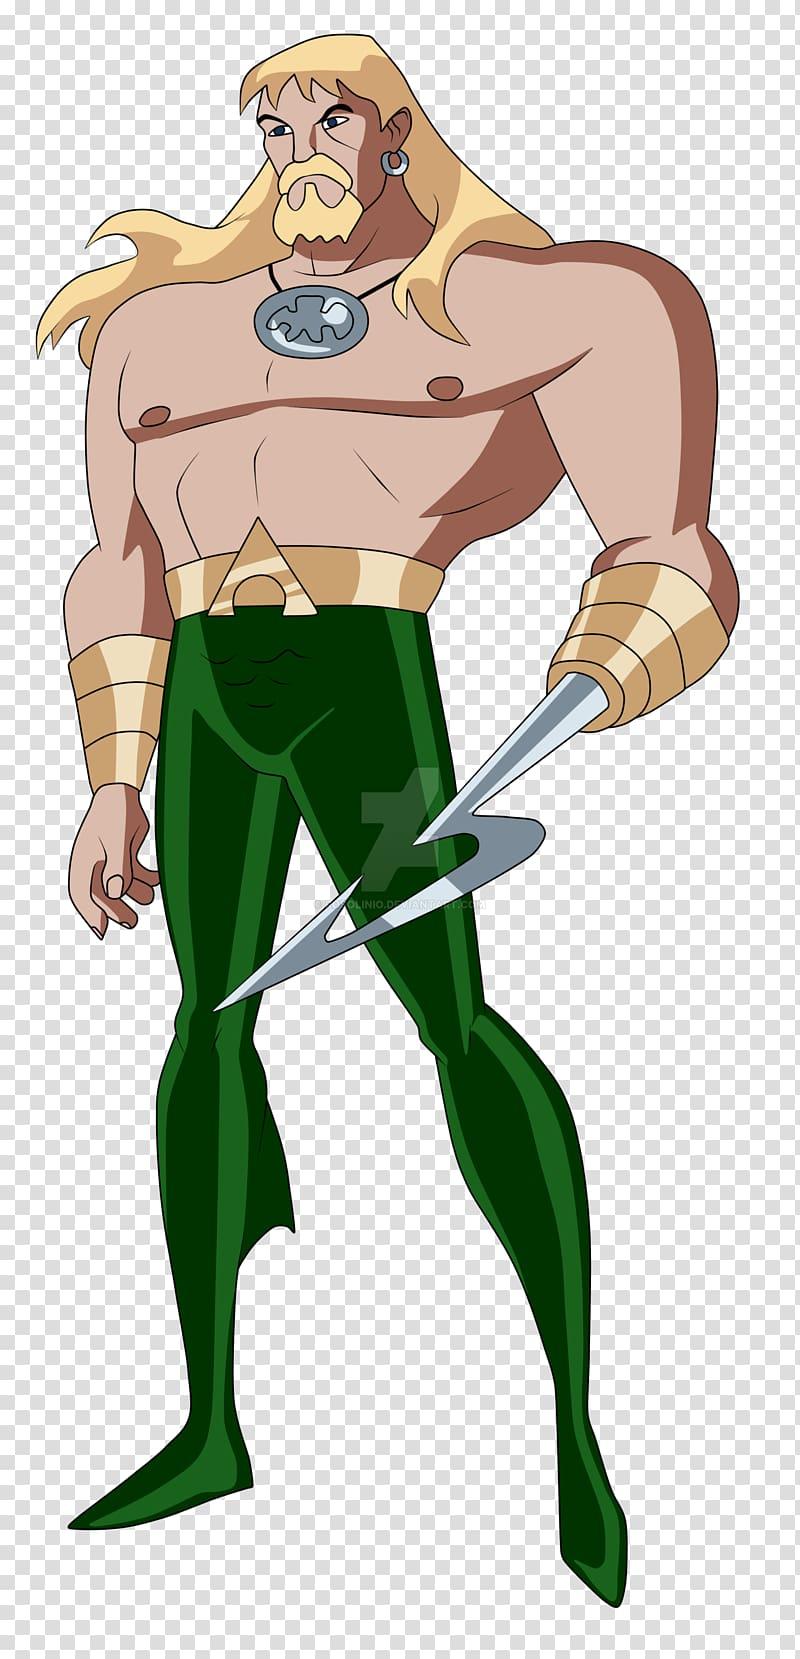 Aquaman Green Lantern Superman Diana Prince Comics, aquaman.